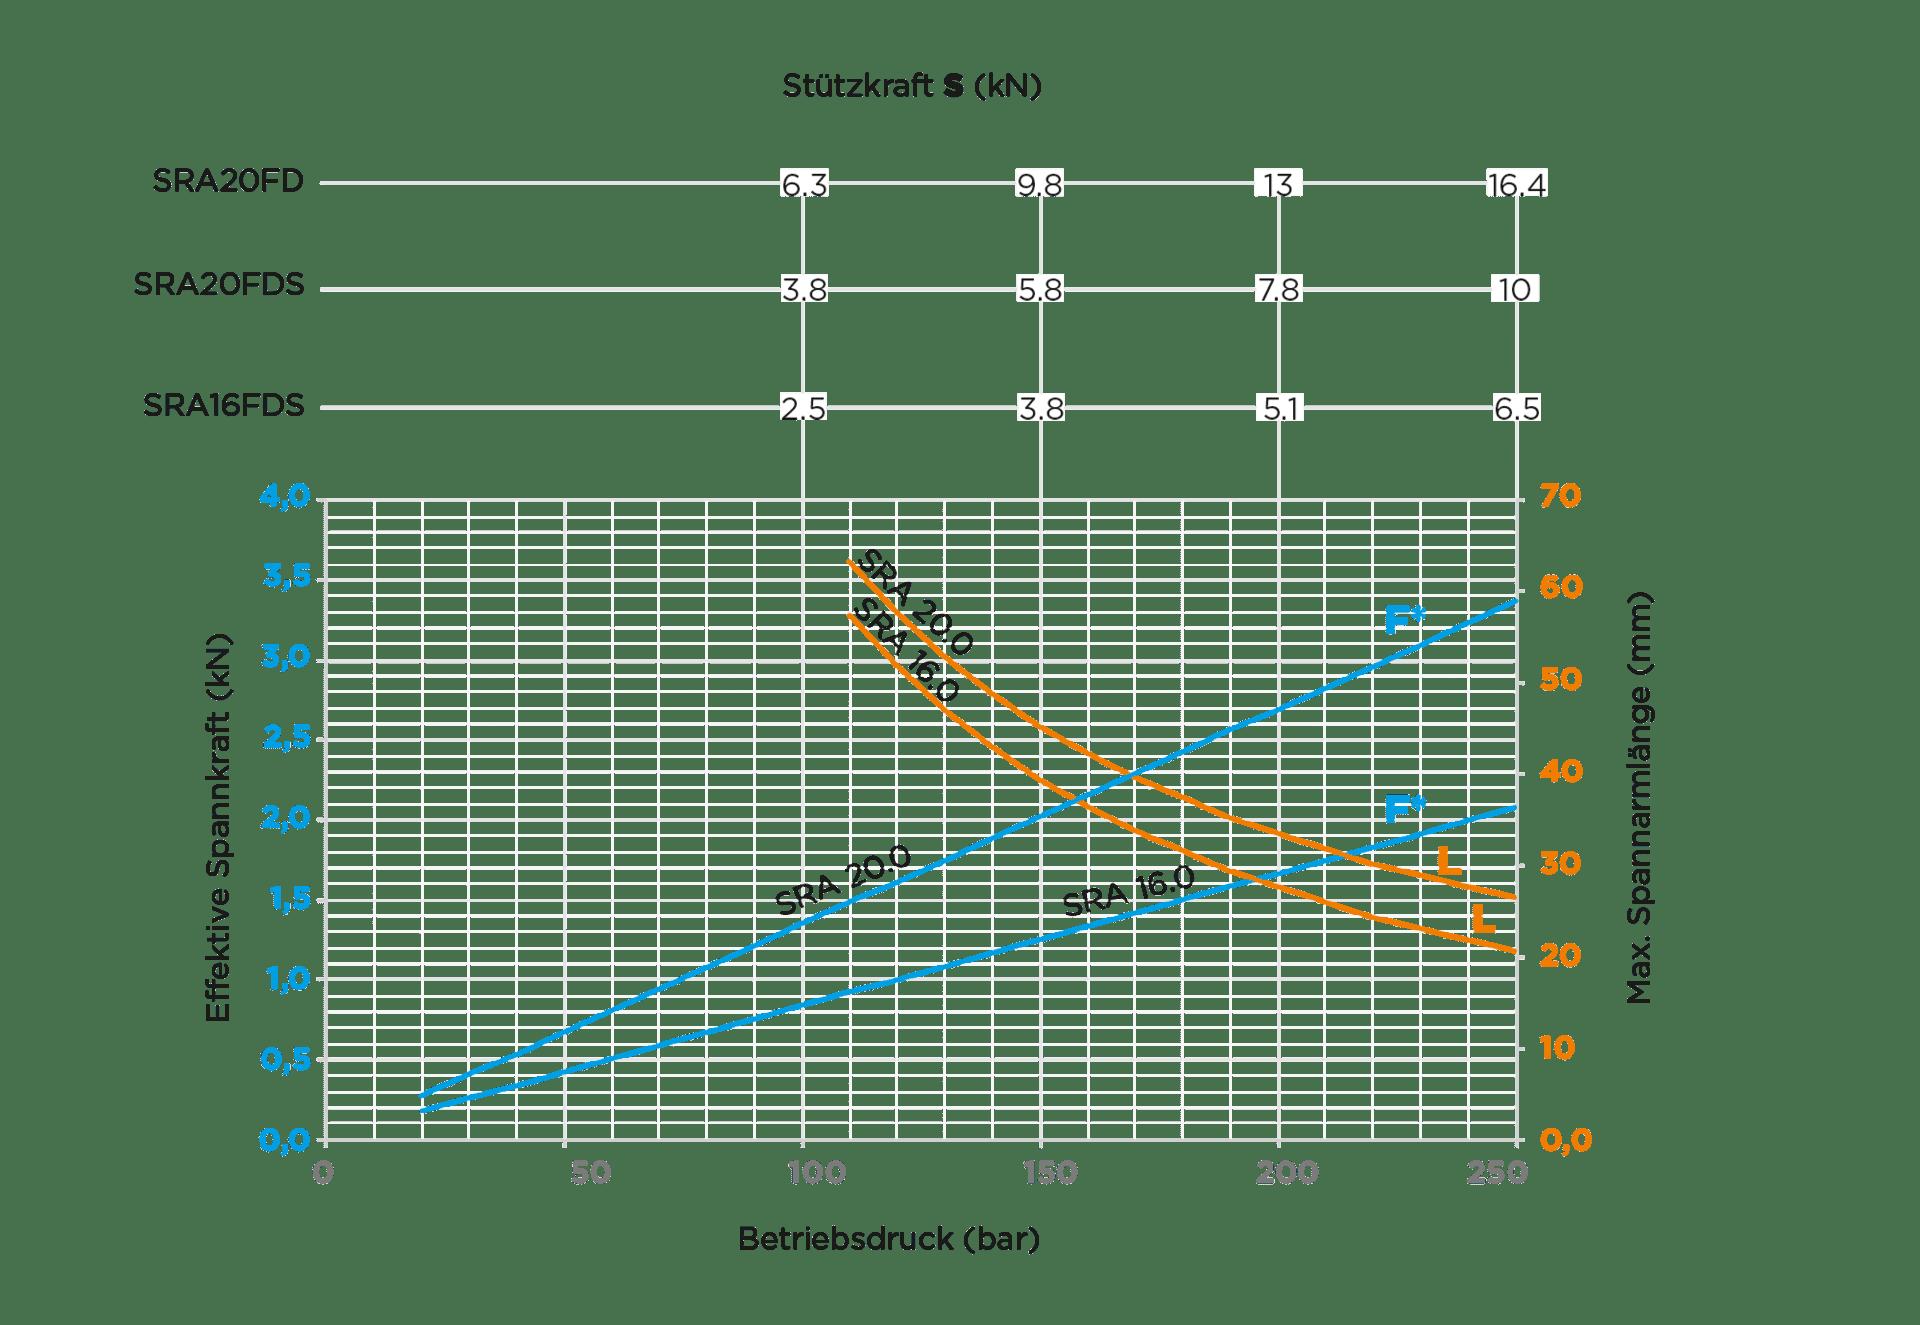 1.1.4. Diagramm